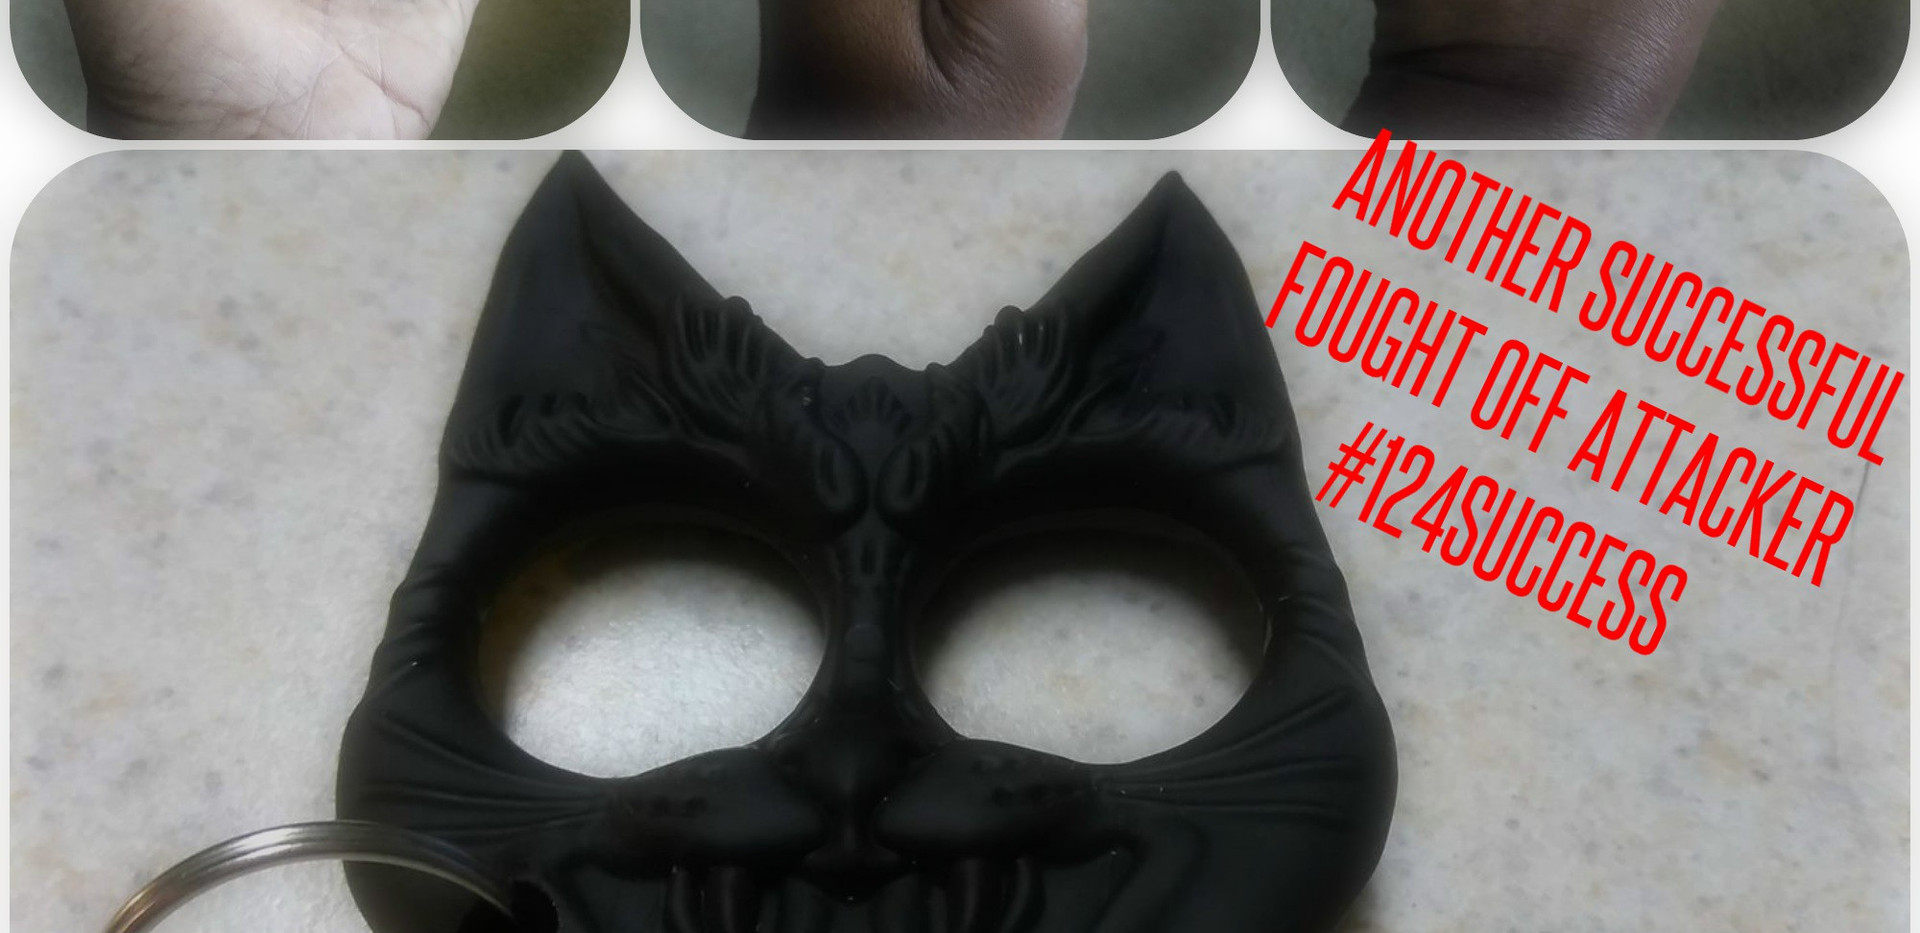 Catfight Ad Best.jpg